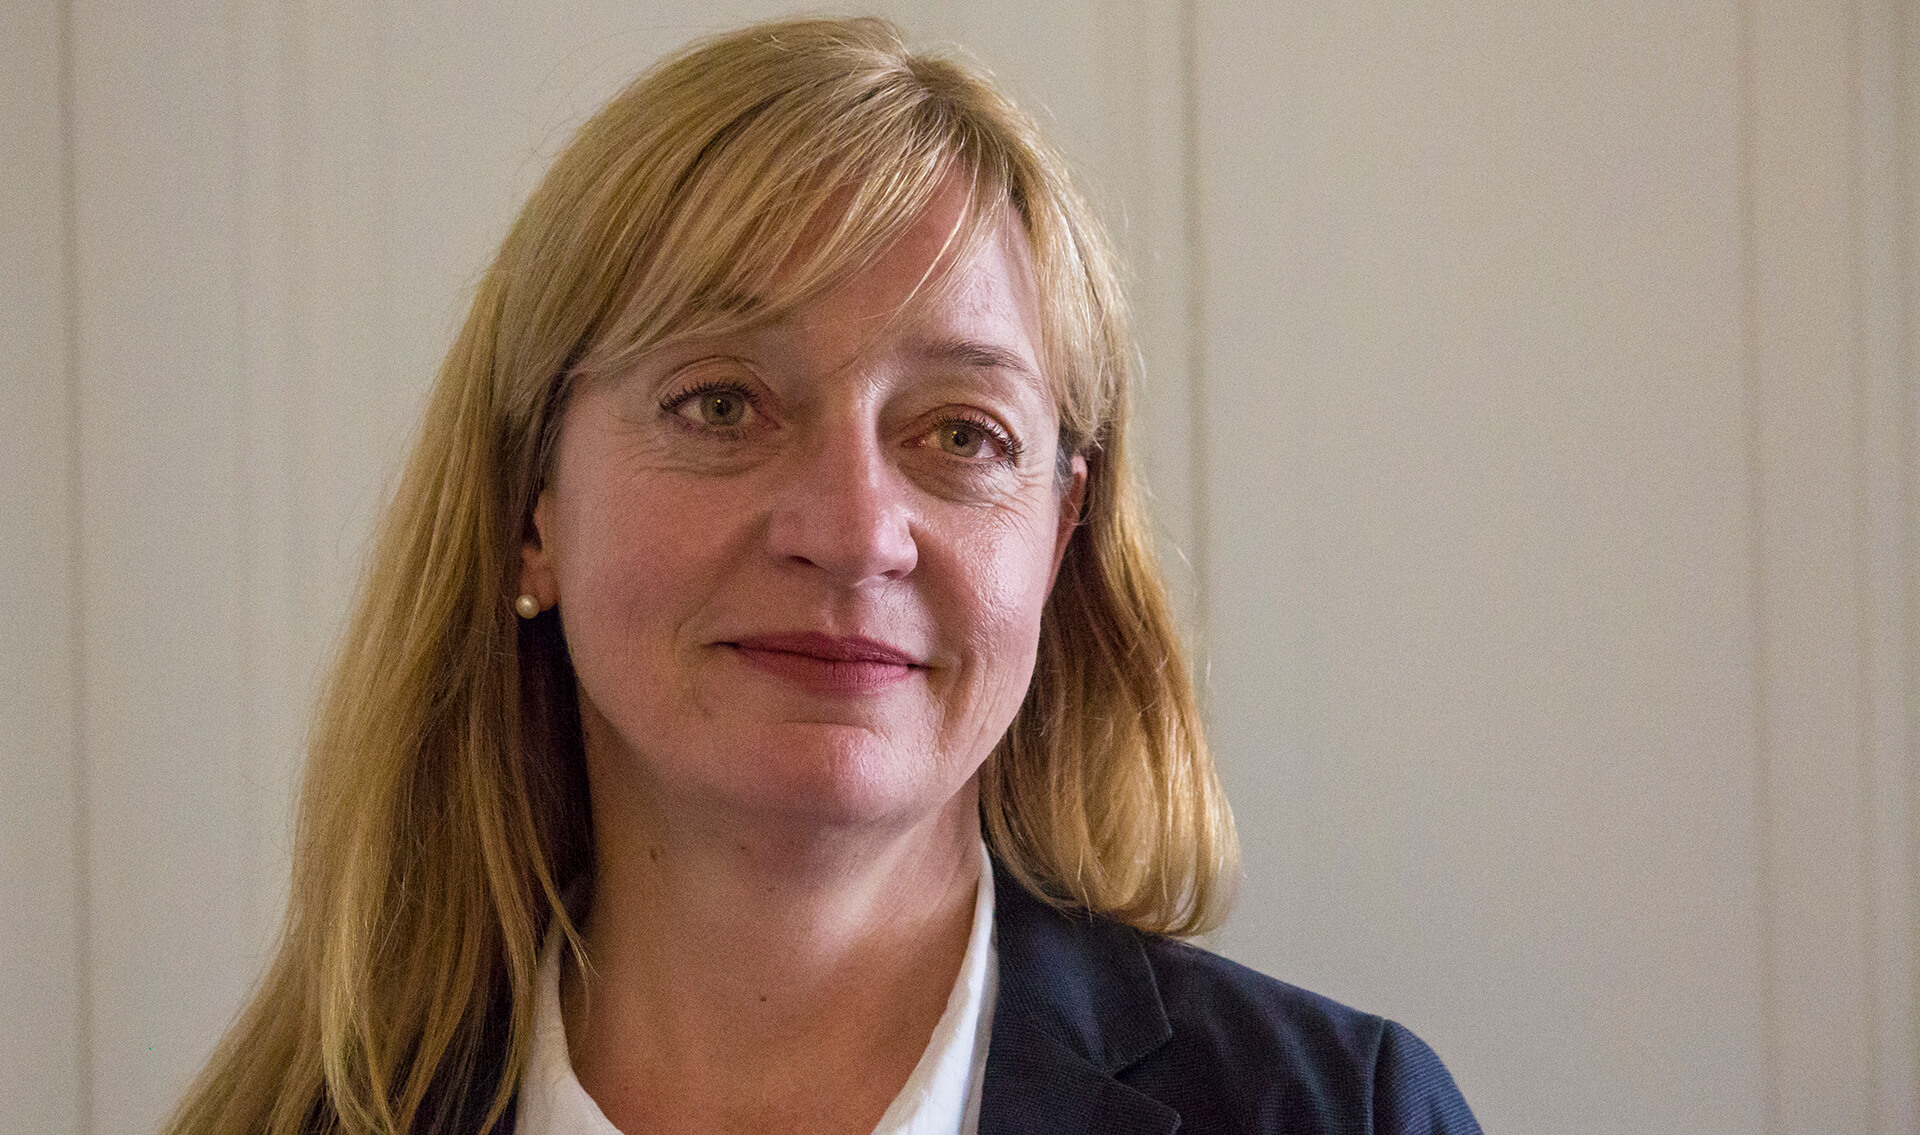 Rechtsanwältin Juliane Wagner